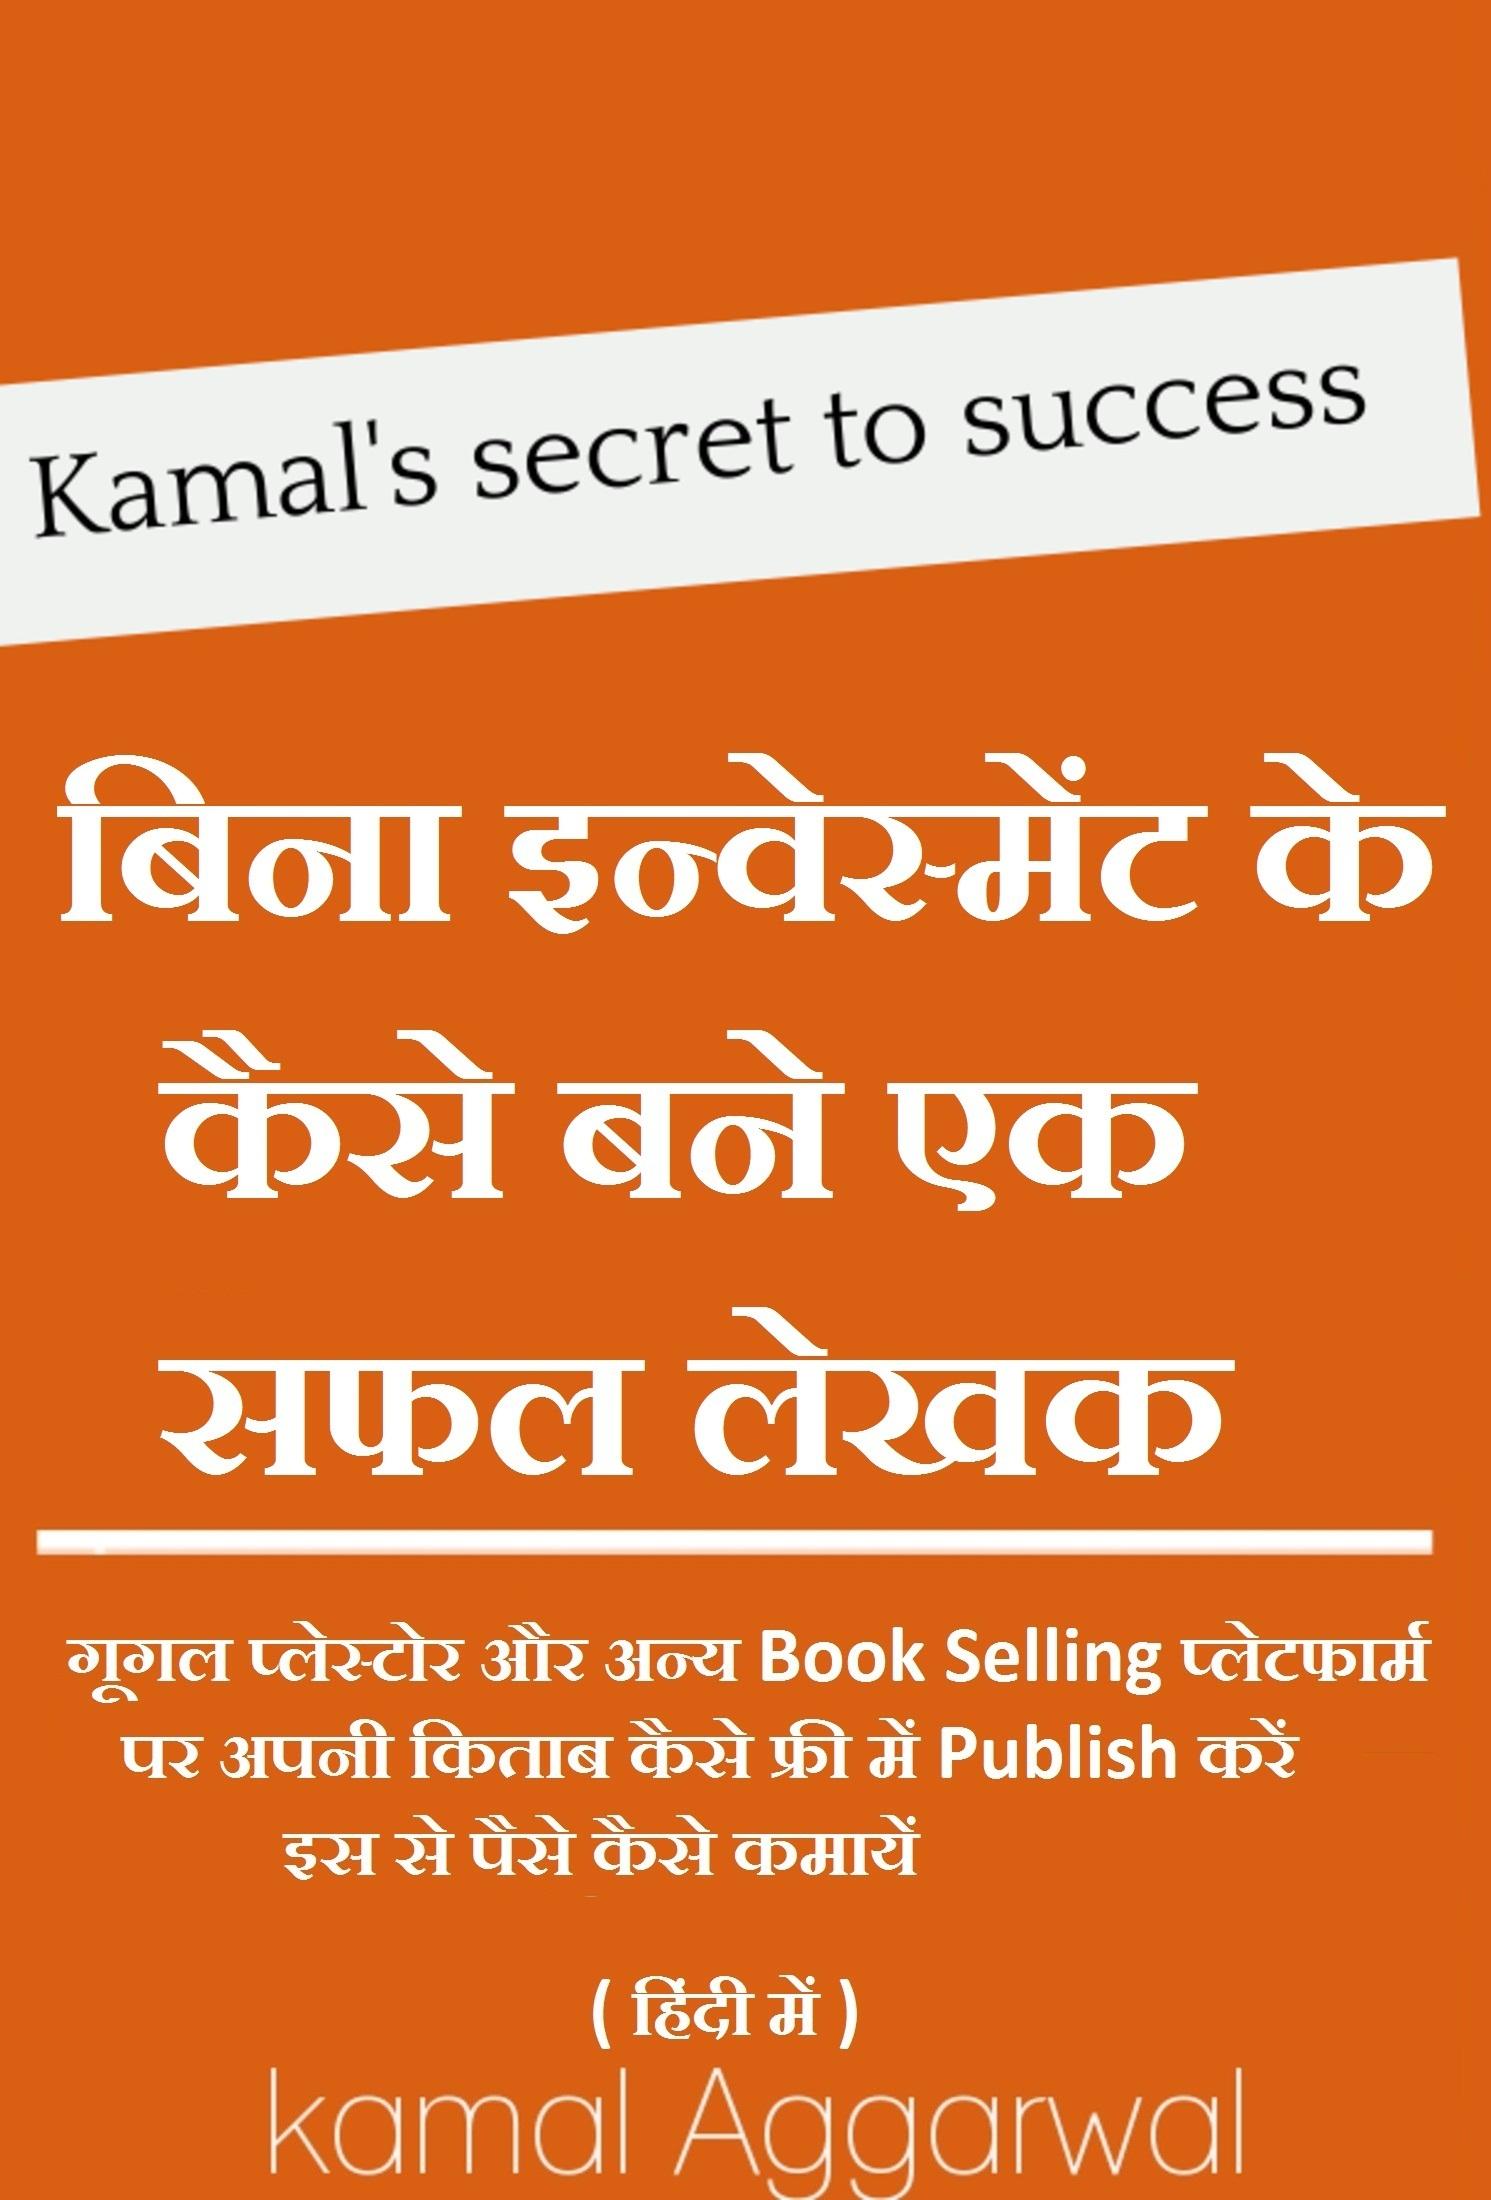 The Secret Full Book In Hindi